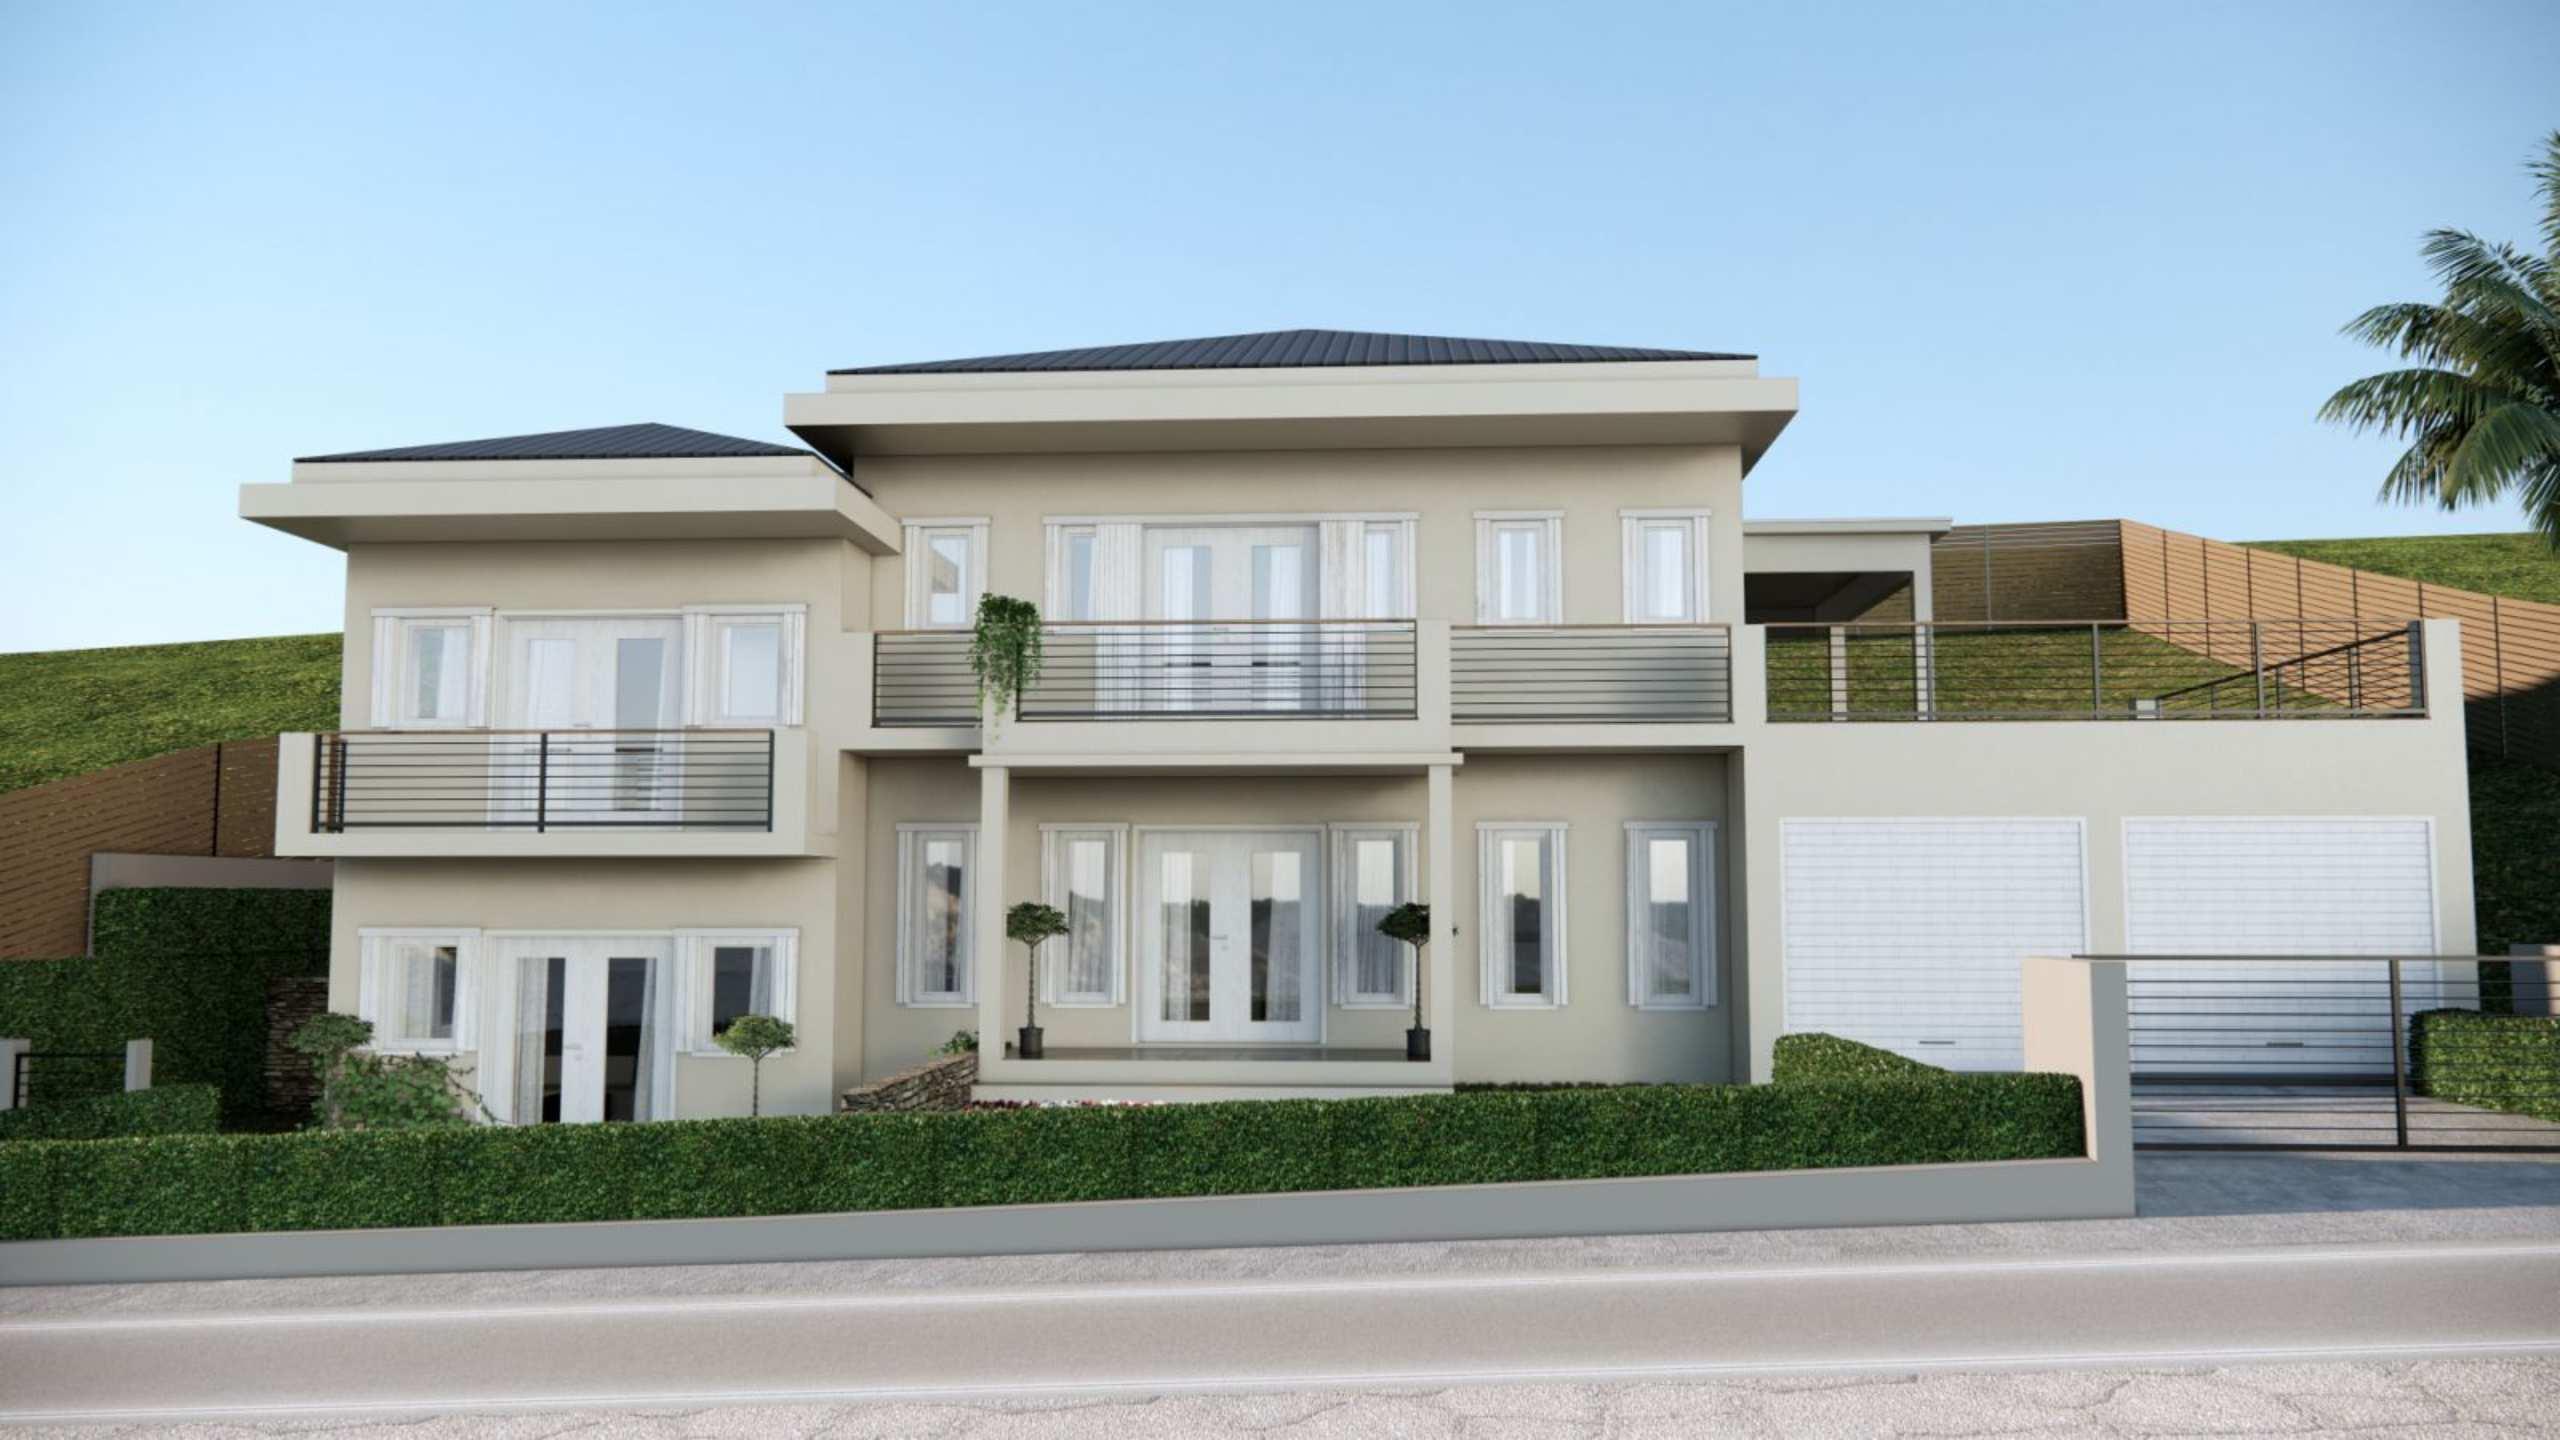 Kenepa Garden Estate St Maarten Land And Homes For Sale